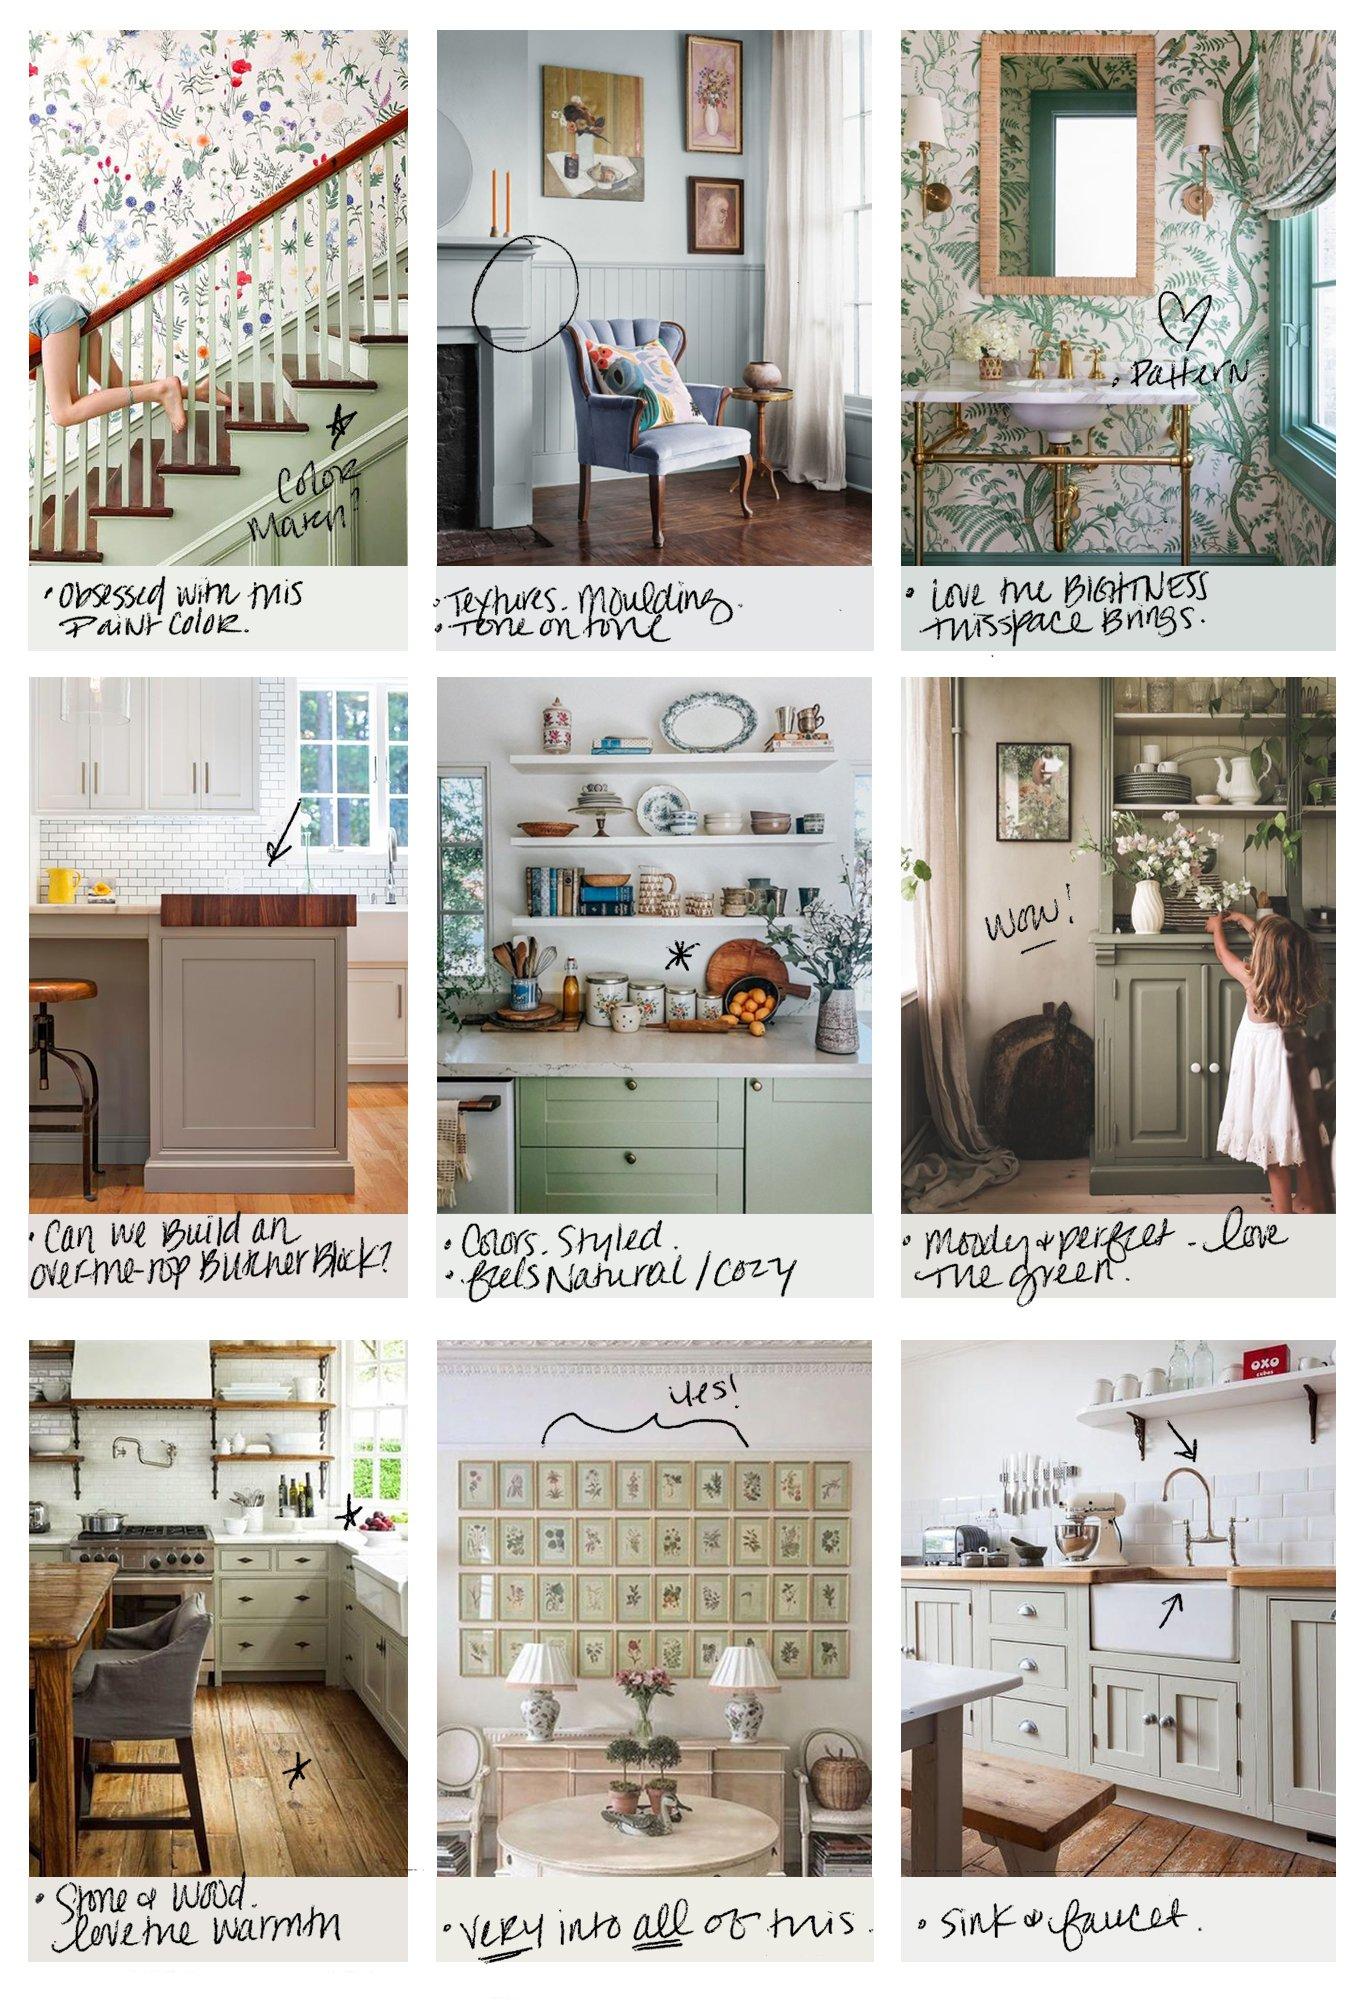 Ashley Brooke's Green Kitchen Inspiration